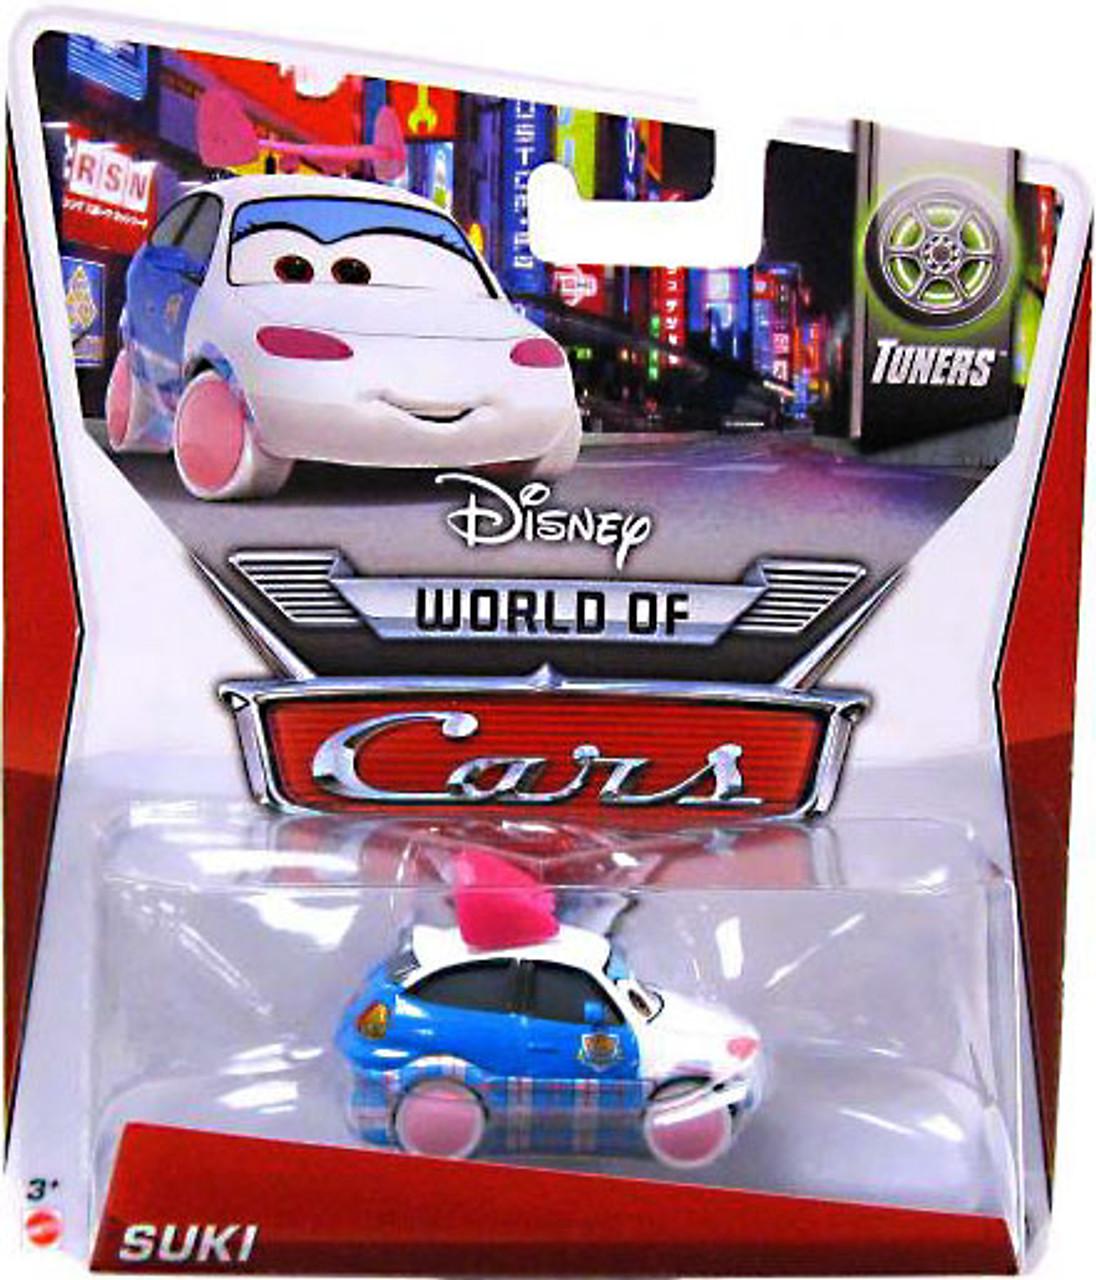 Disney Cars The World of Cars Series 2 Suki Diecast Car #2 of 8